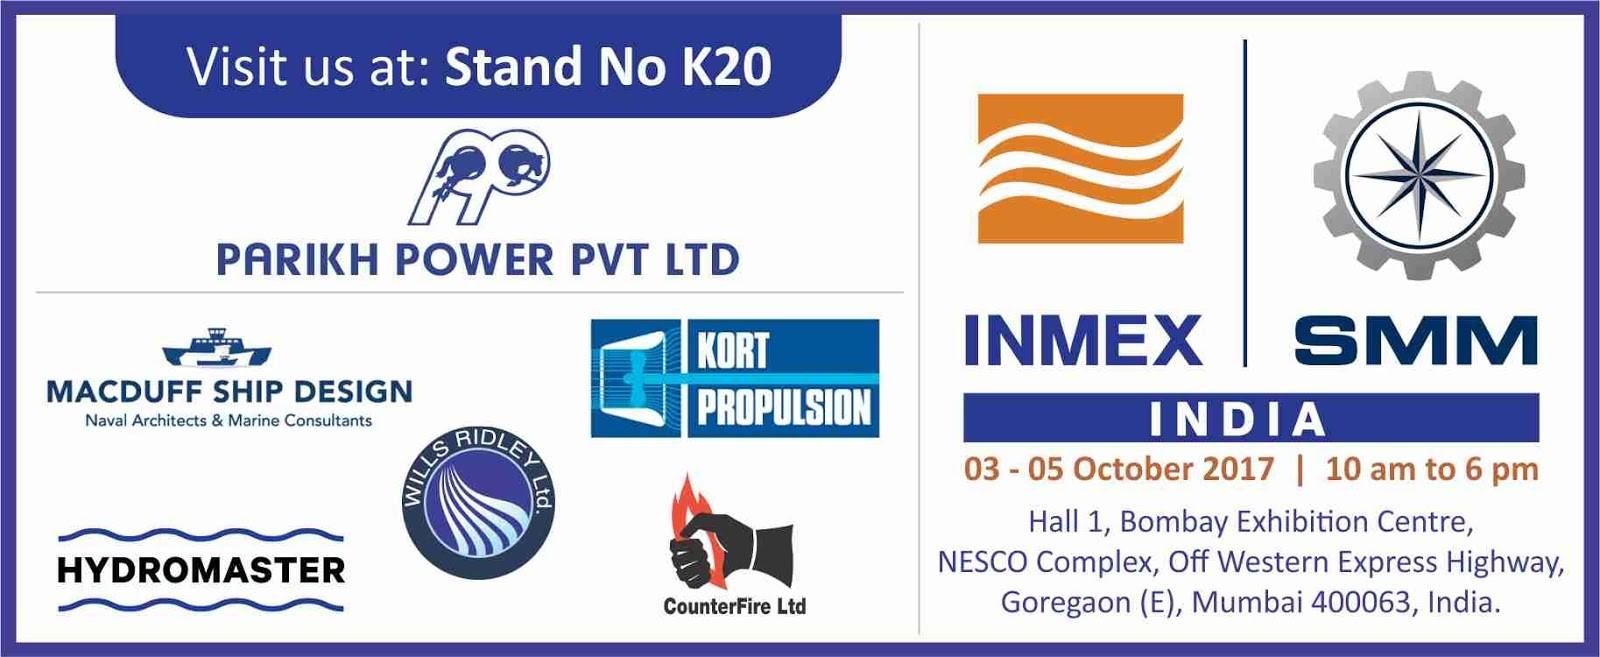 Inmex India 2017 Hydromaster Pioneers Of Steerable Propulsion